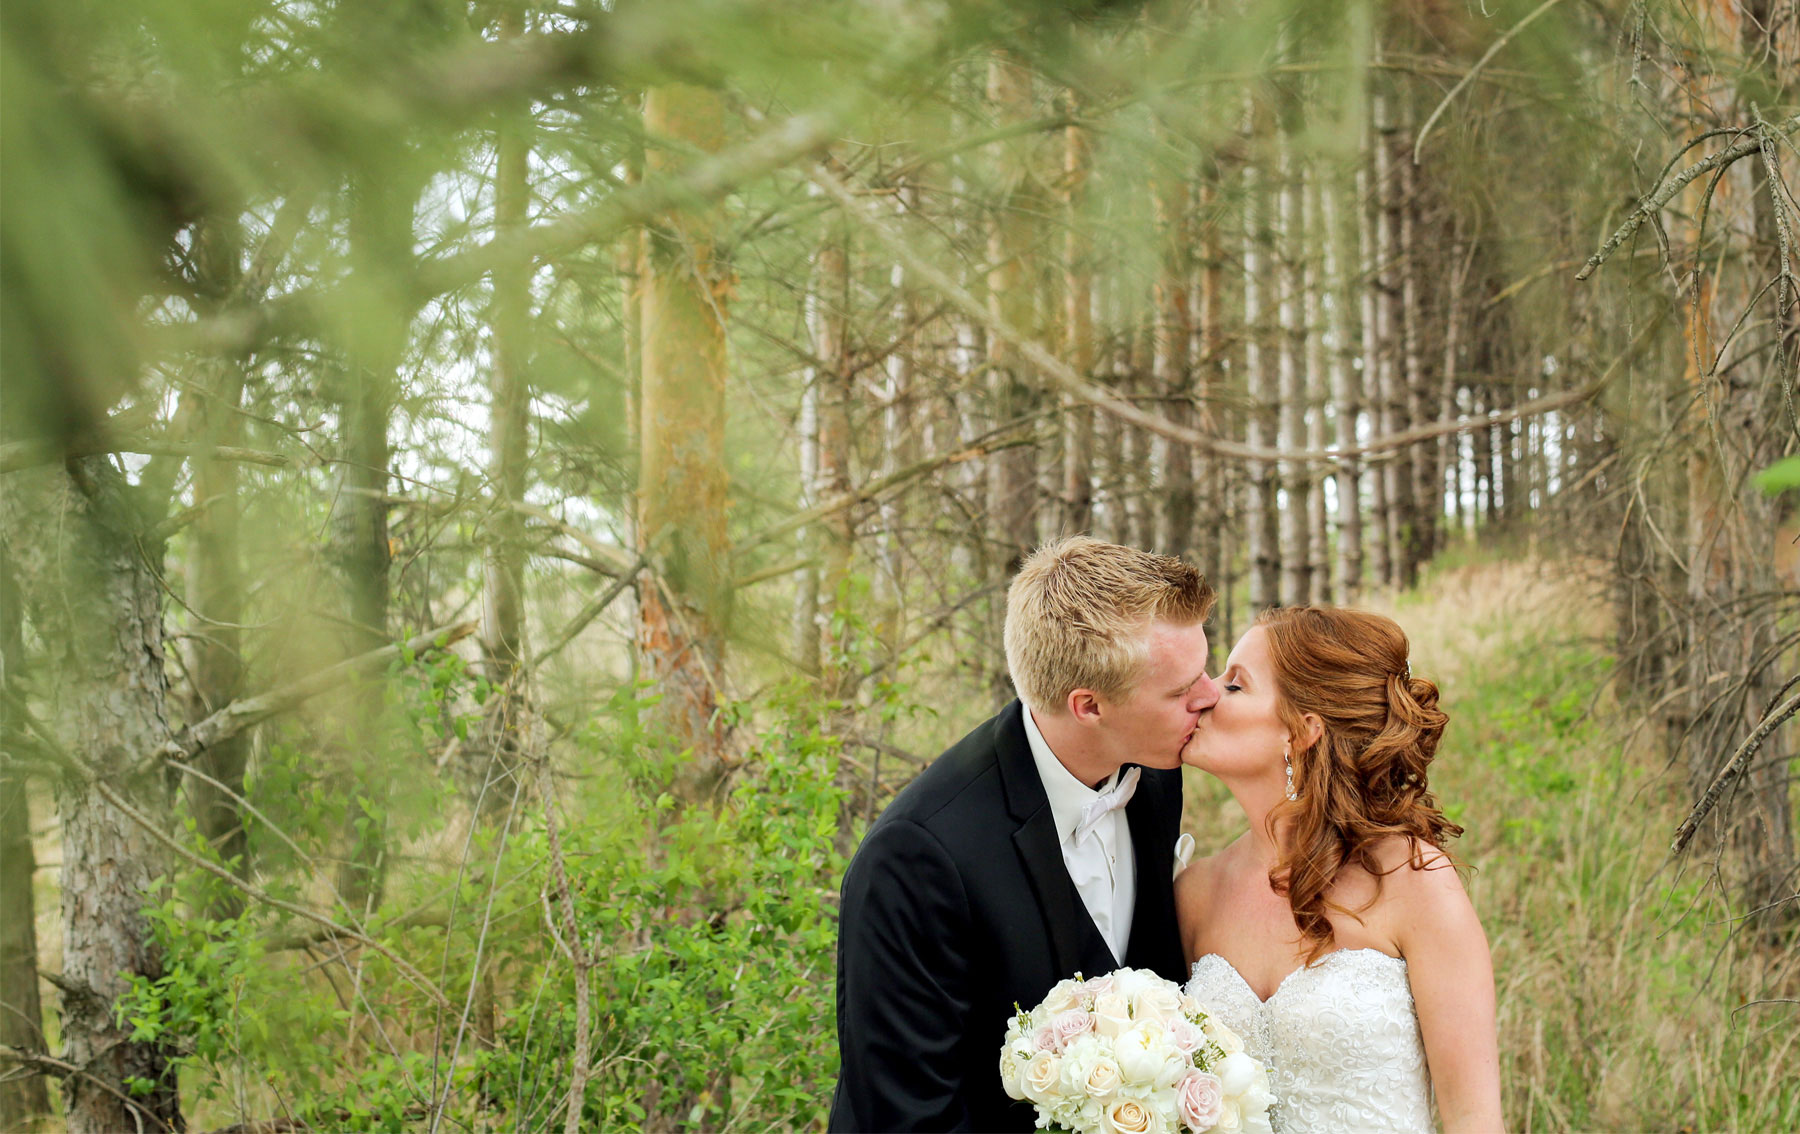 04-Minneapolis-Minnesota-Wedding-Photography-by-Vick-Photography-First-Look-Tianna-&-Matt.jpg